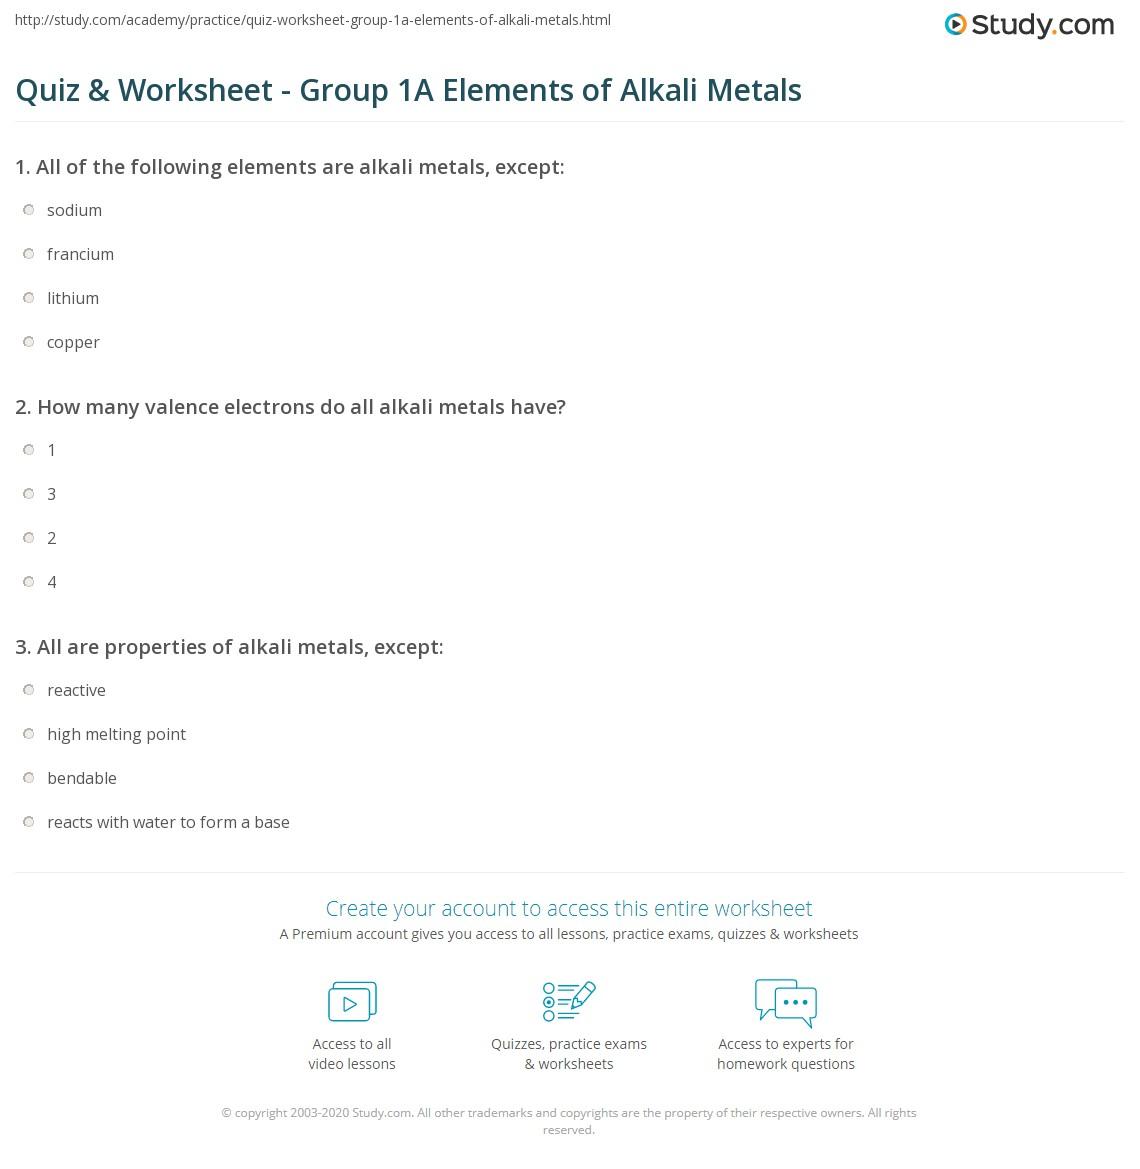 Quiz Worksheet Group 1A Elements of Alkali Metals – Ipc Worksheets